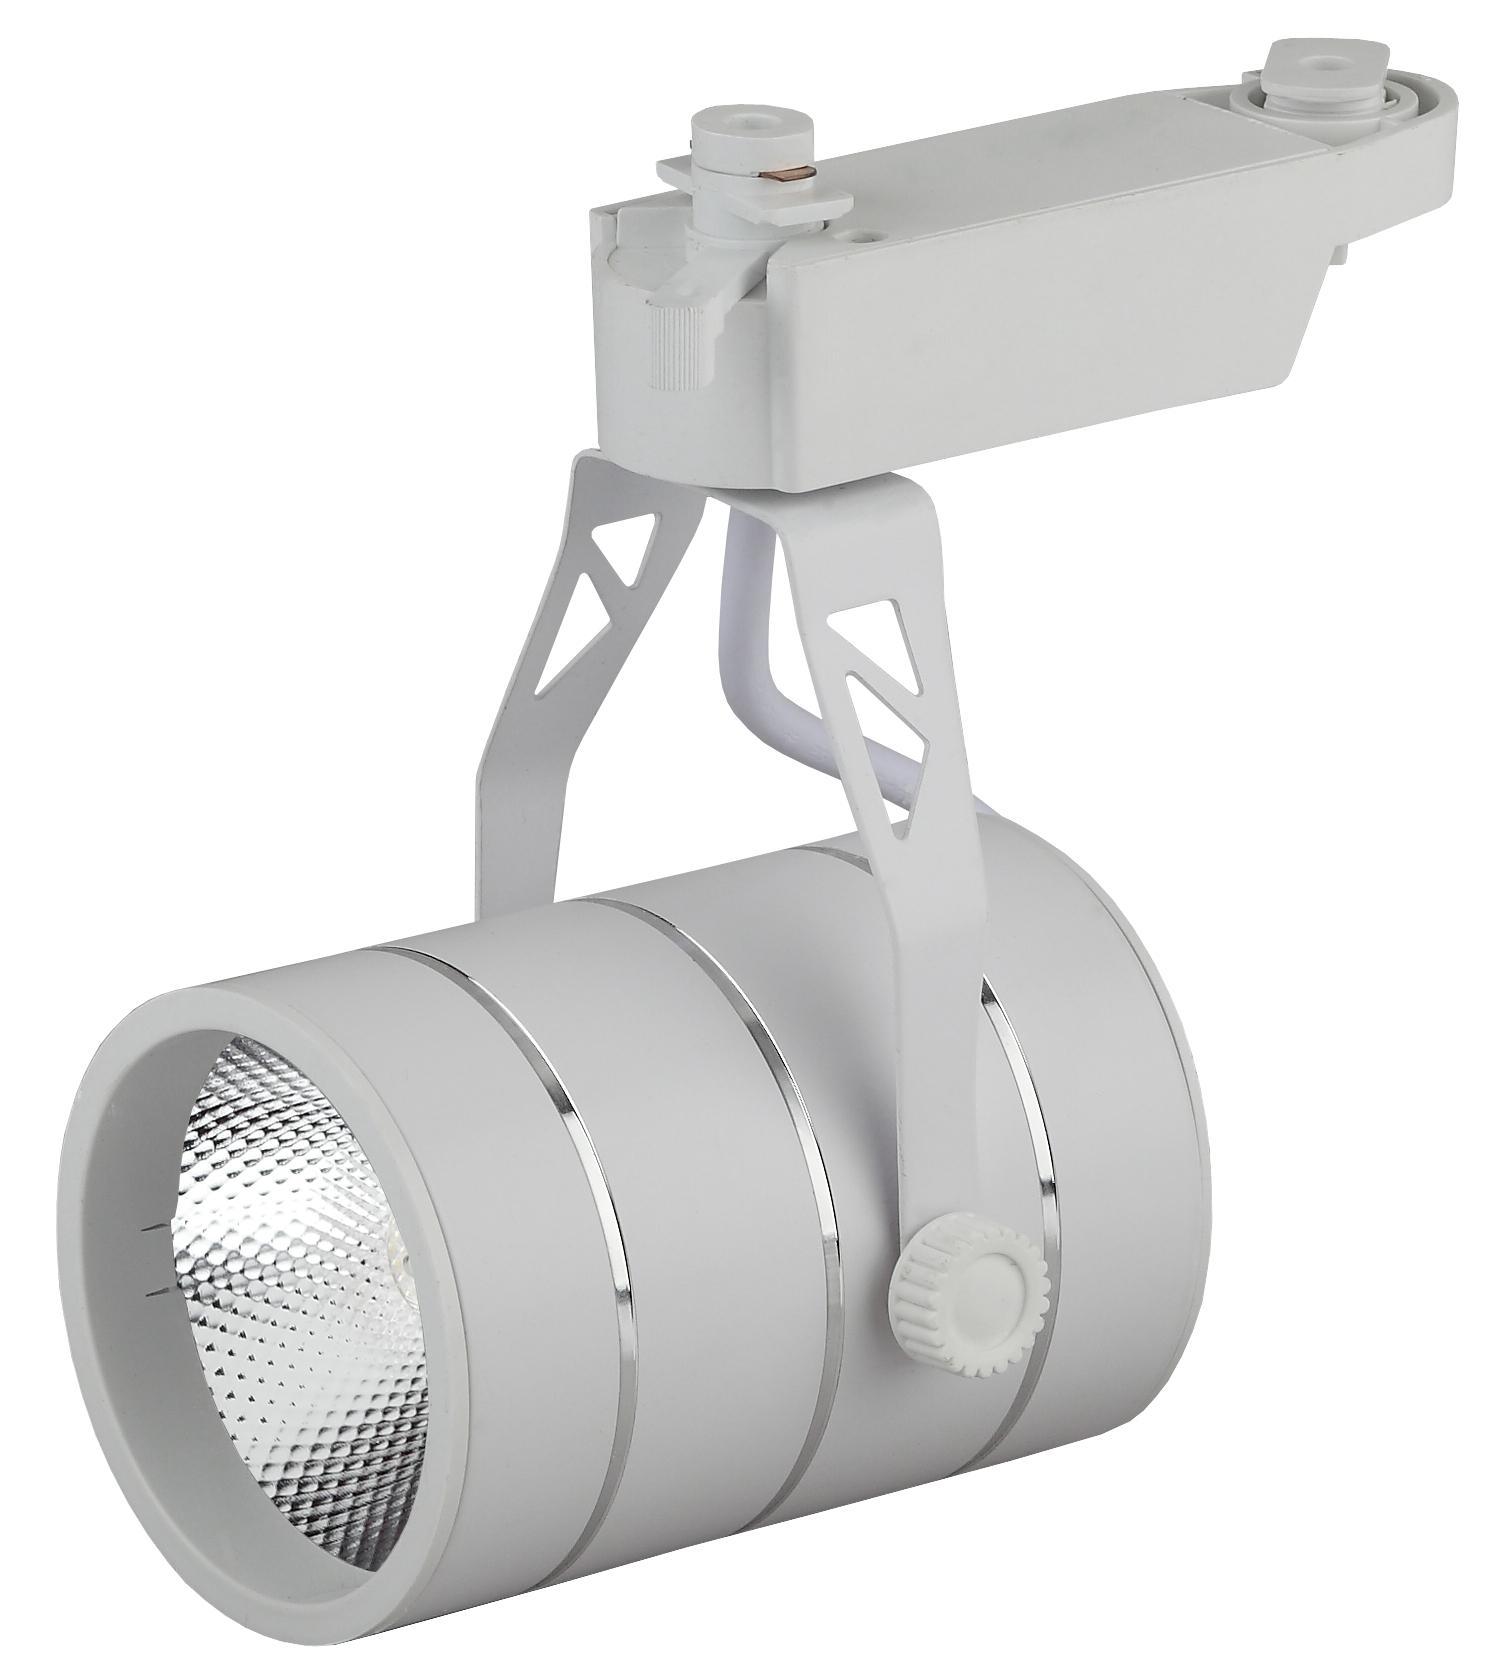 Светильник ЭРА Tr3 - 10 wh цена и фото